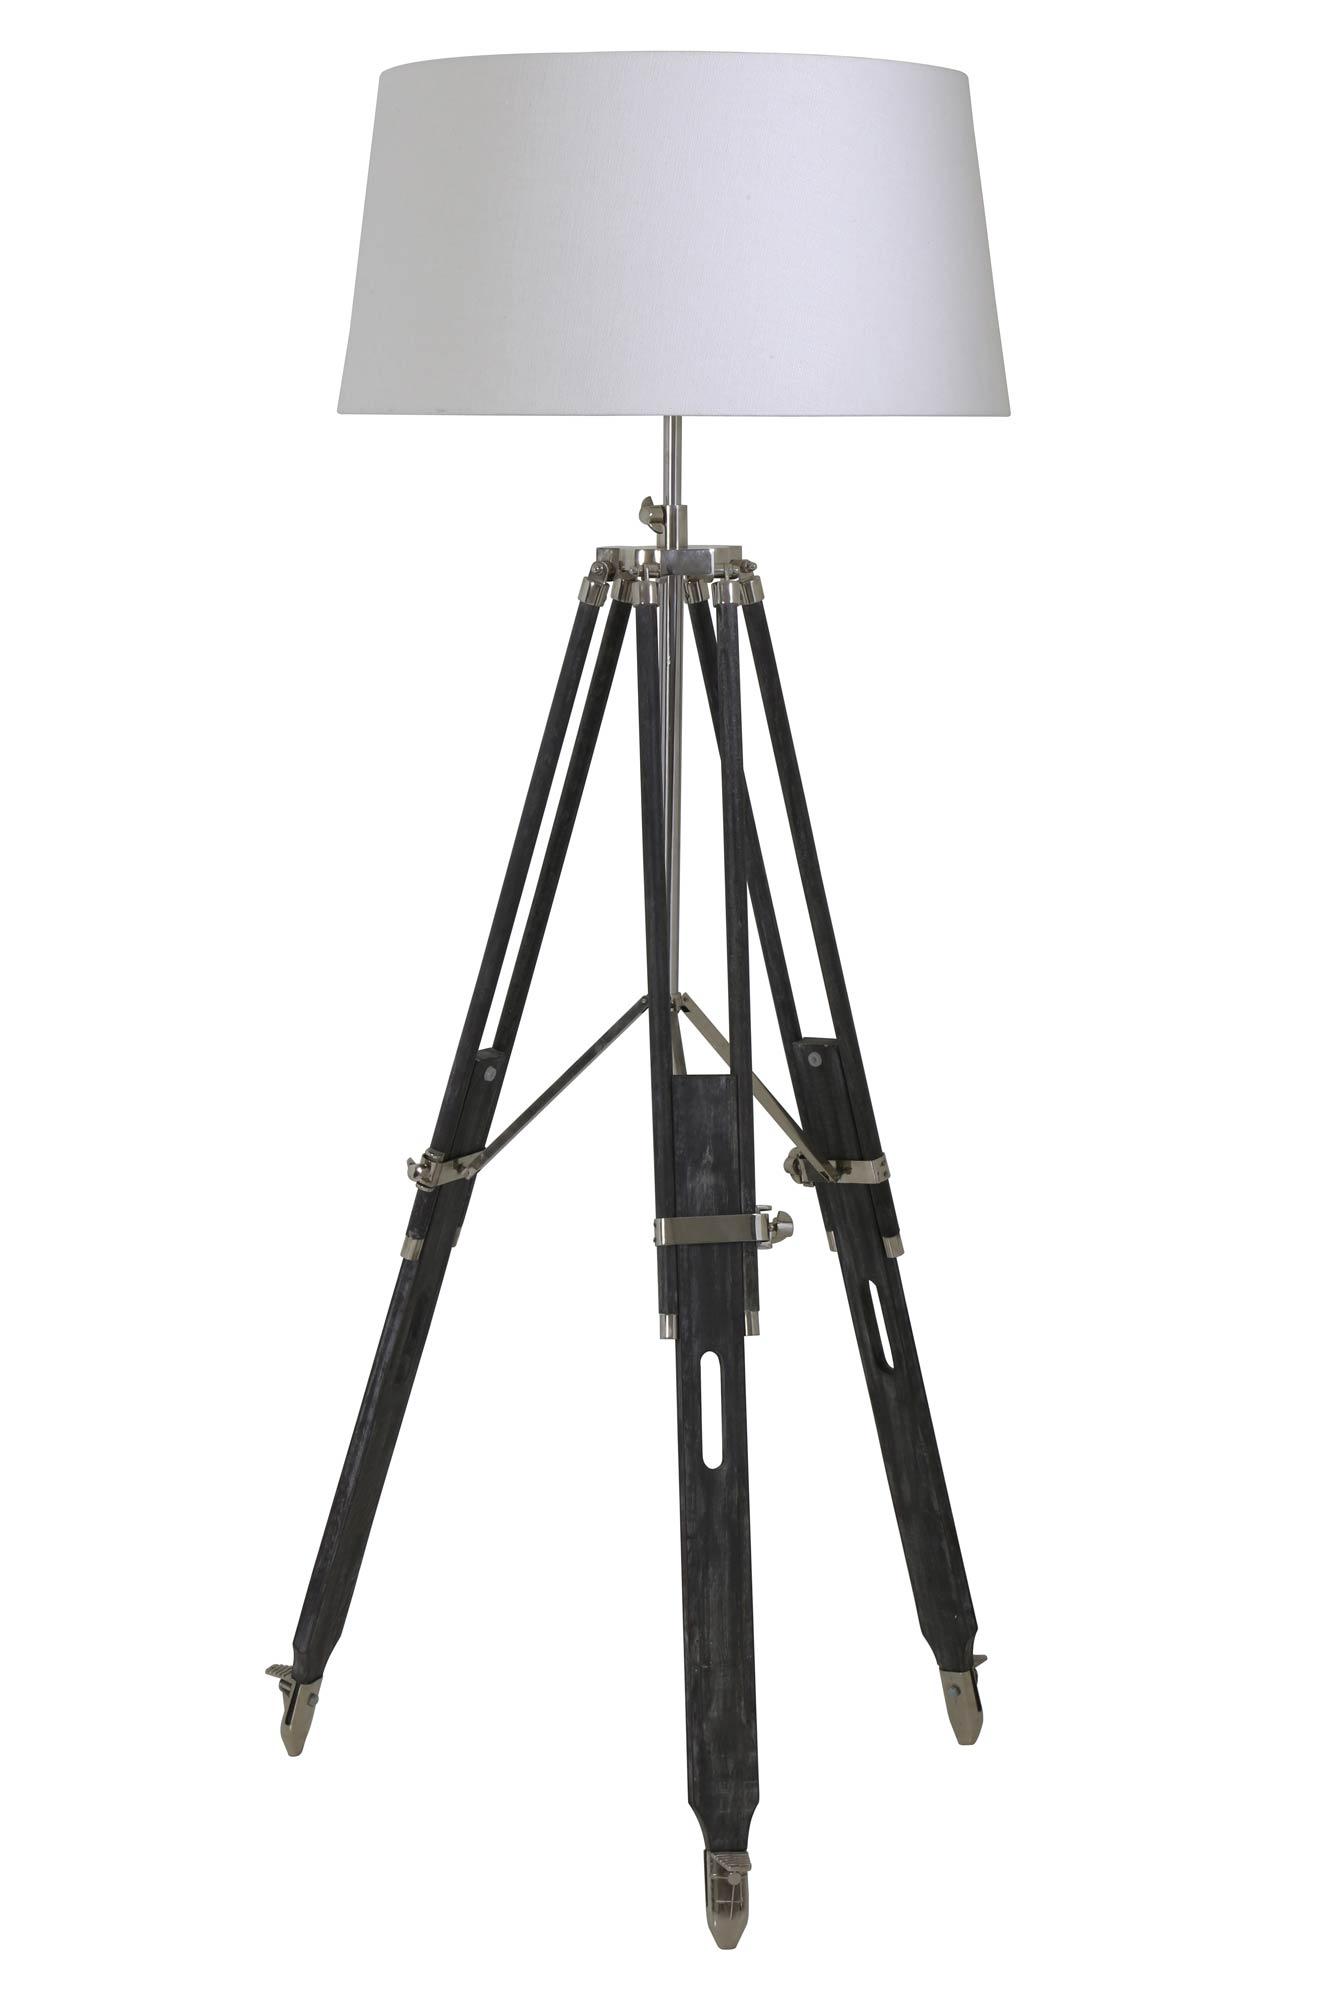 Boudin Tripod Adjustable Floor Lamp By Light U0026 Living | 8223527 2070886